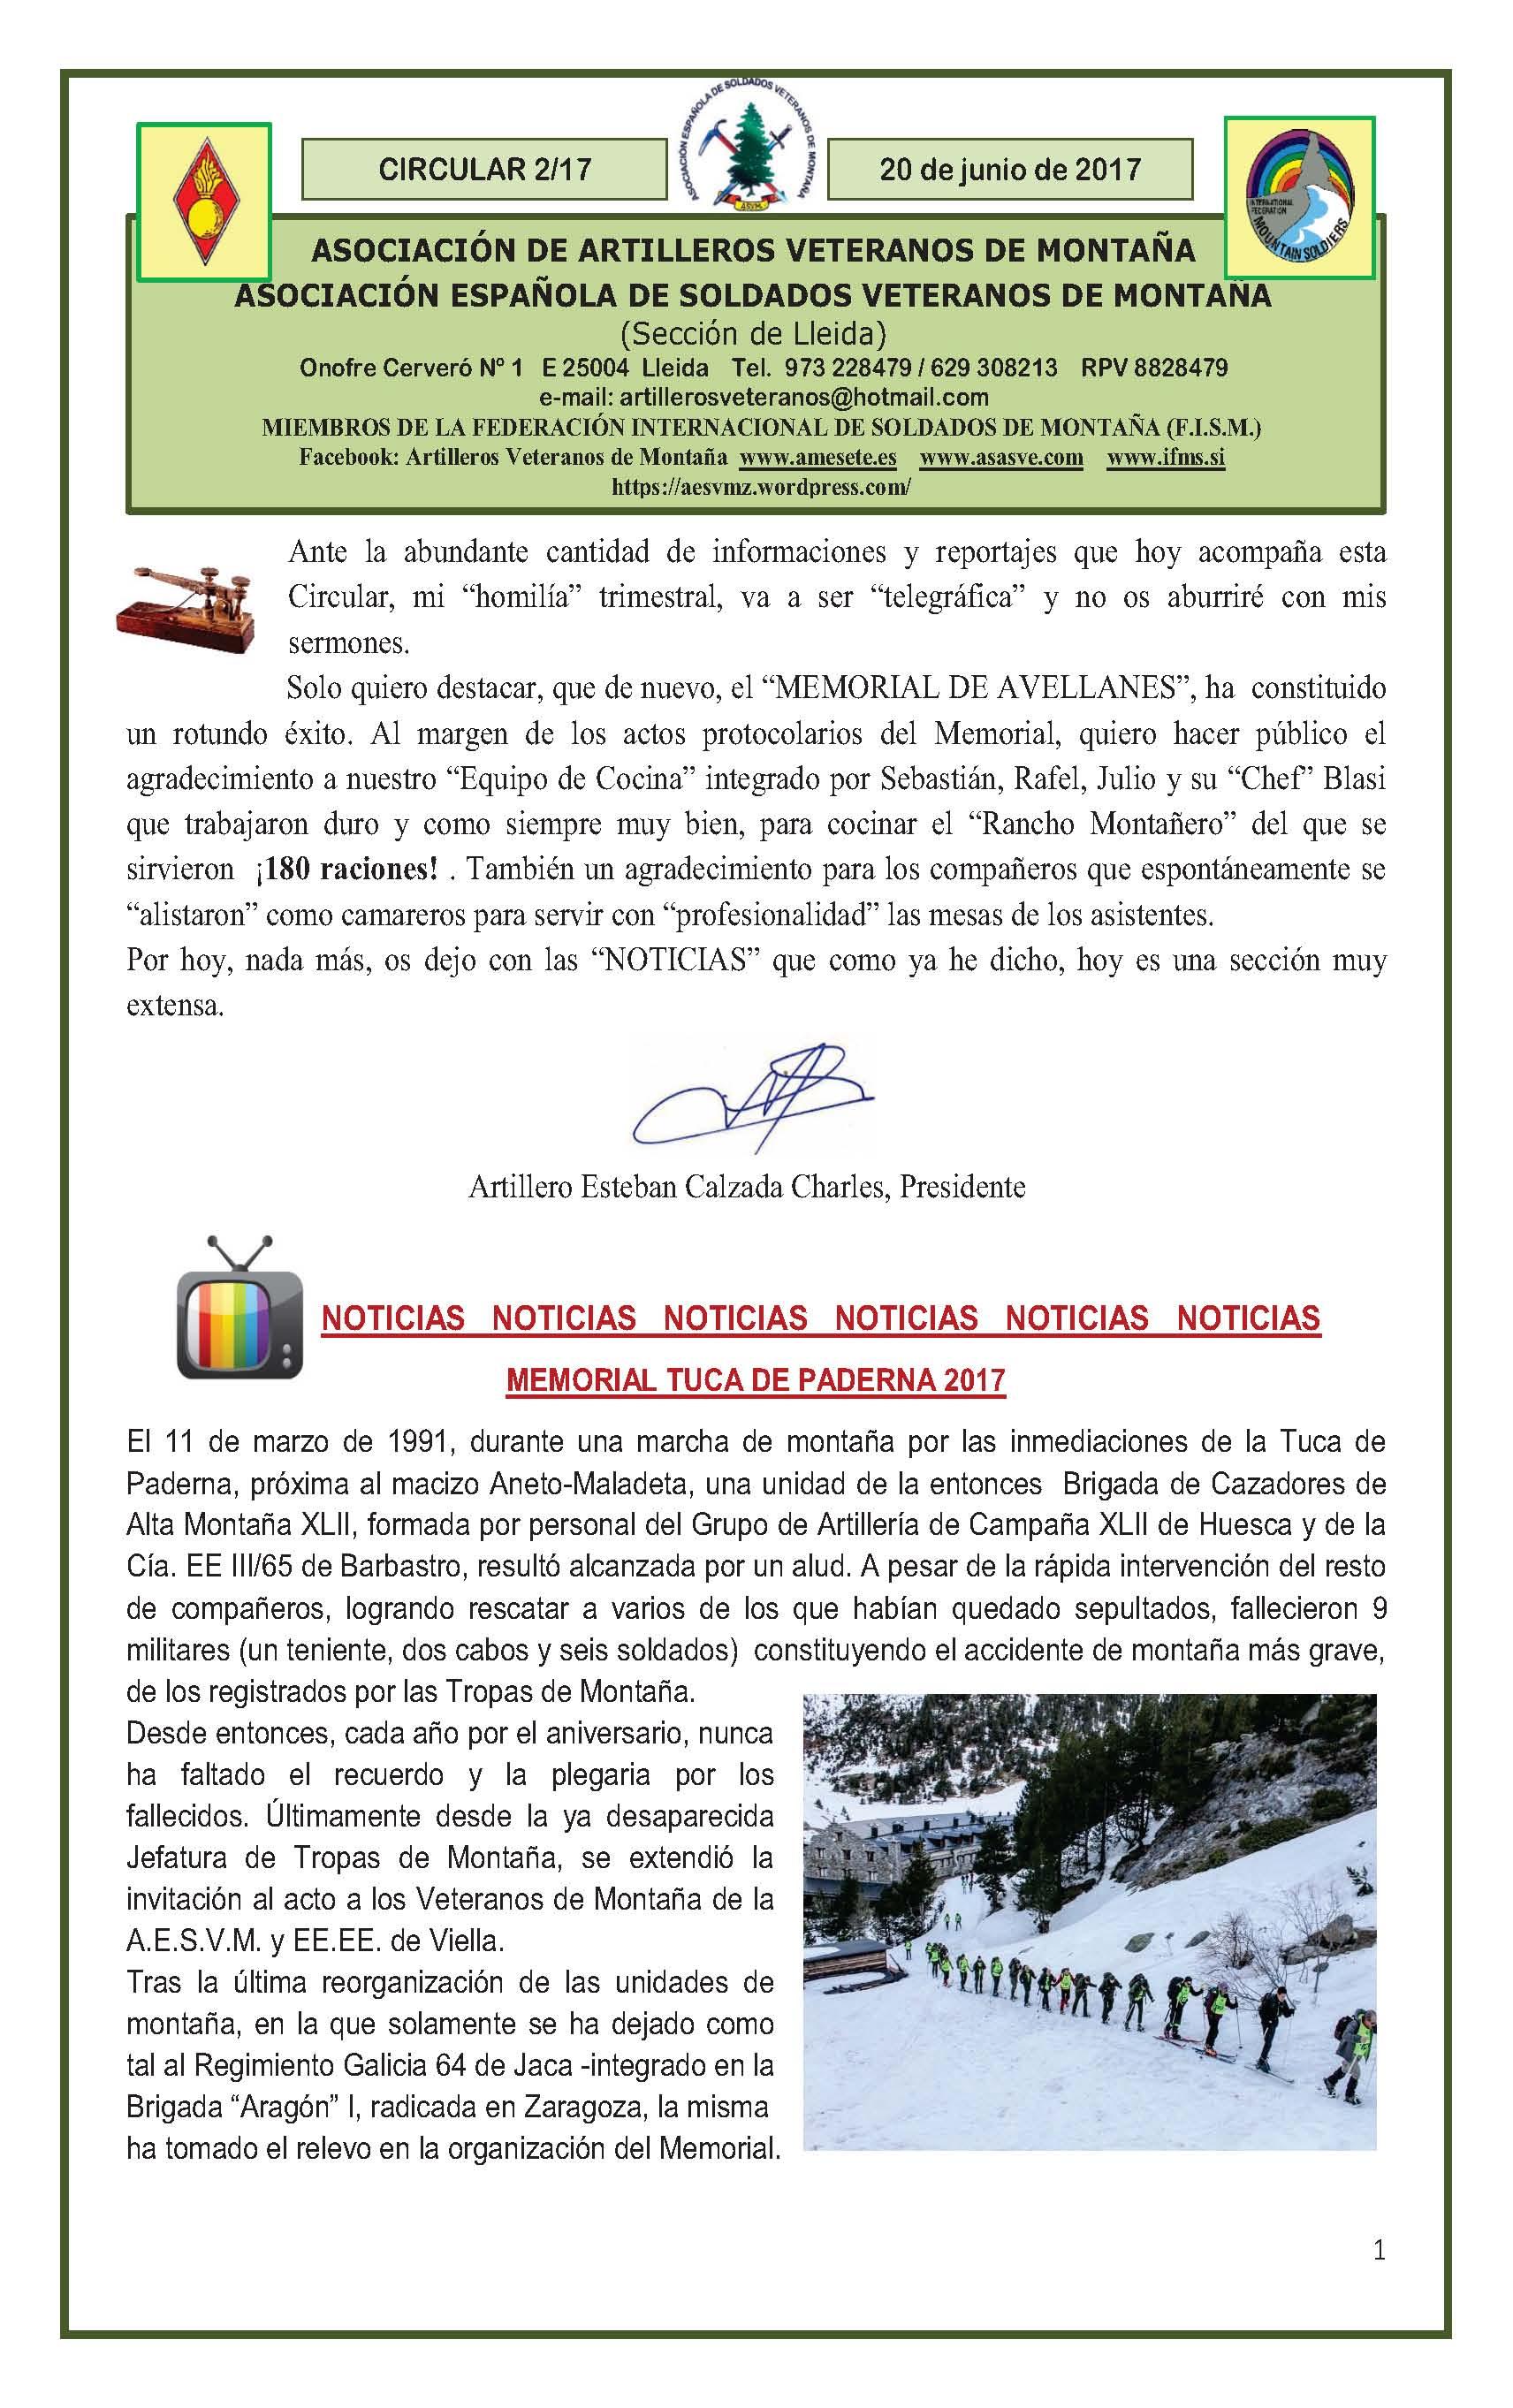 Revista AAVM. CIRCULAR 2-17r